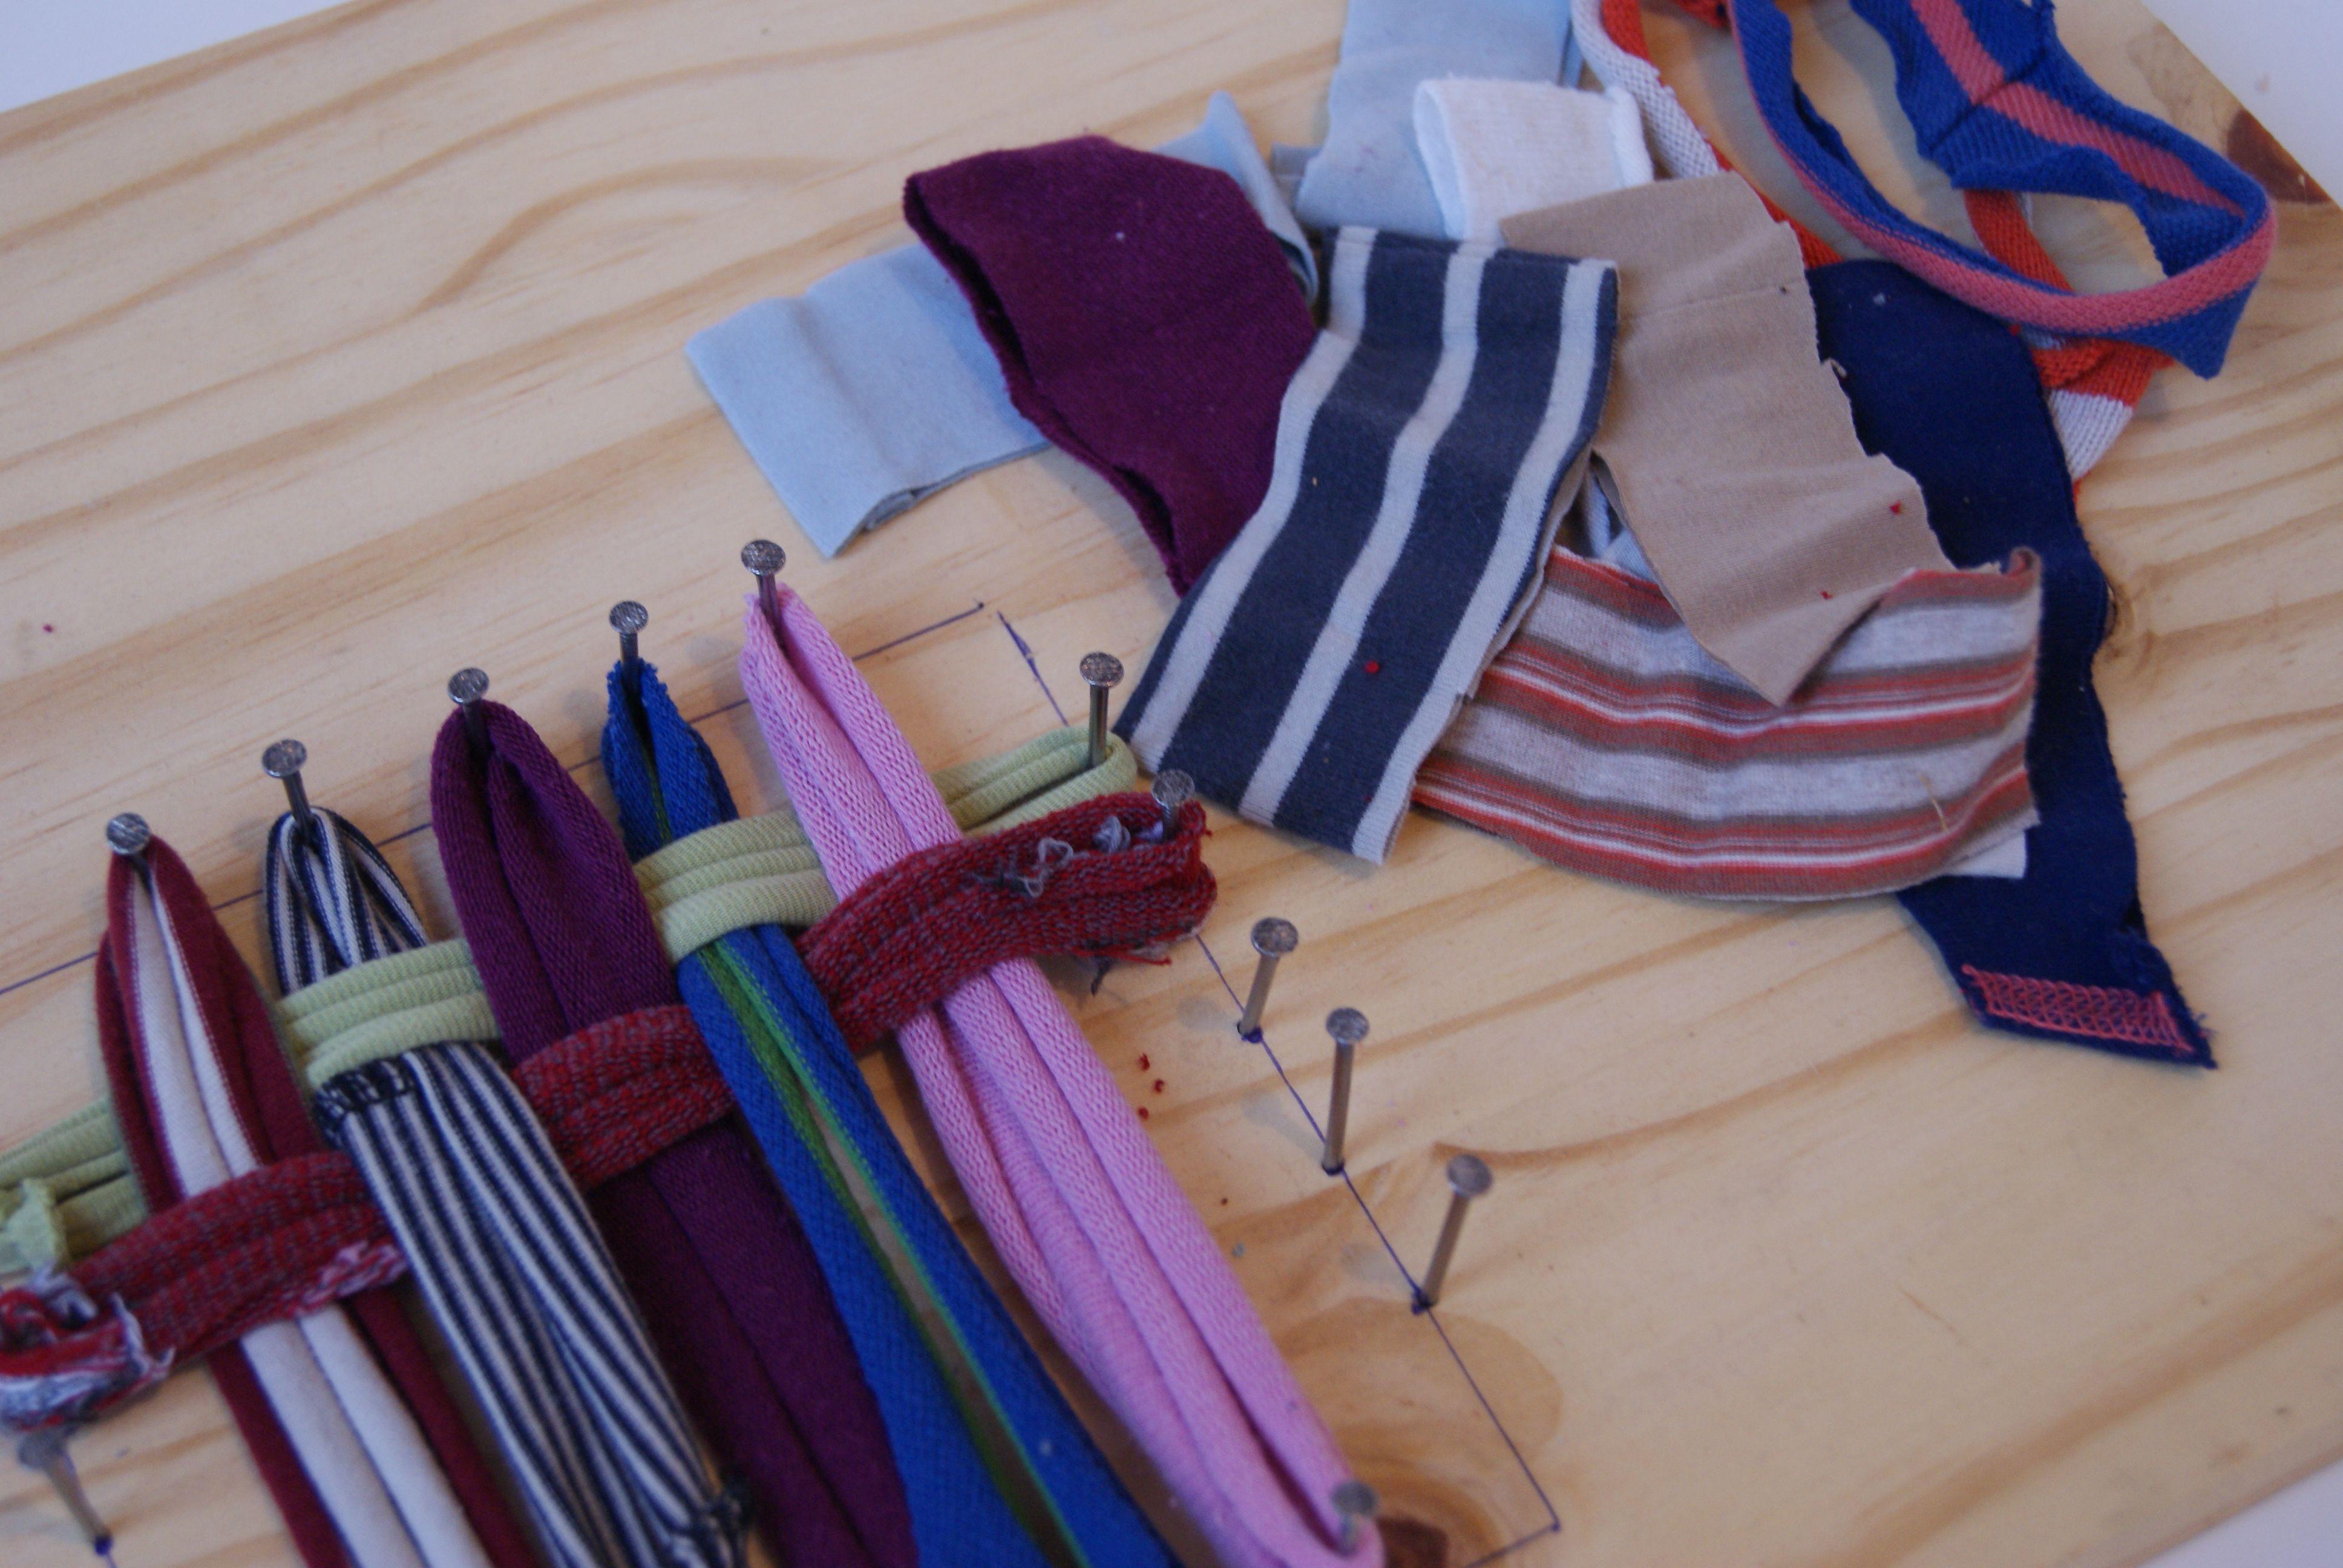 recycler le tissu en tawashi id es de bricolage pinterest les tissus tissu et z ro. Black Bedroom Furniture Sets. Home Design Ideas